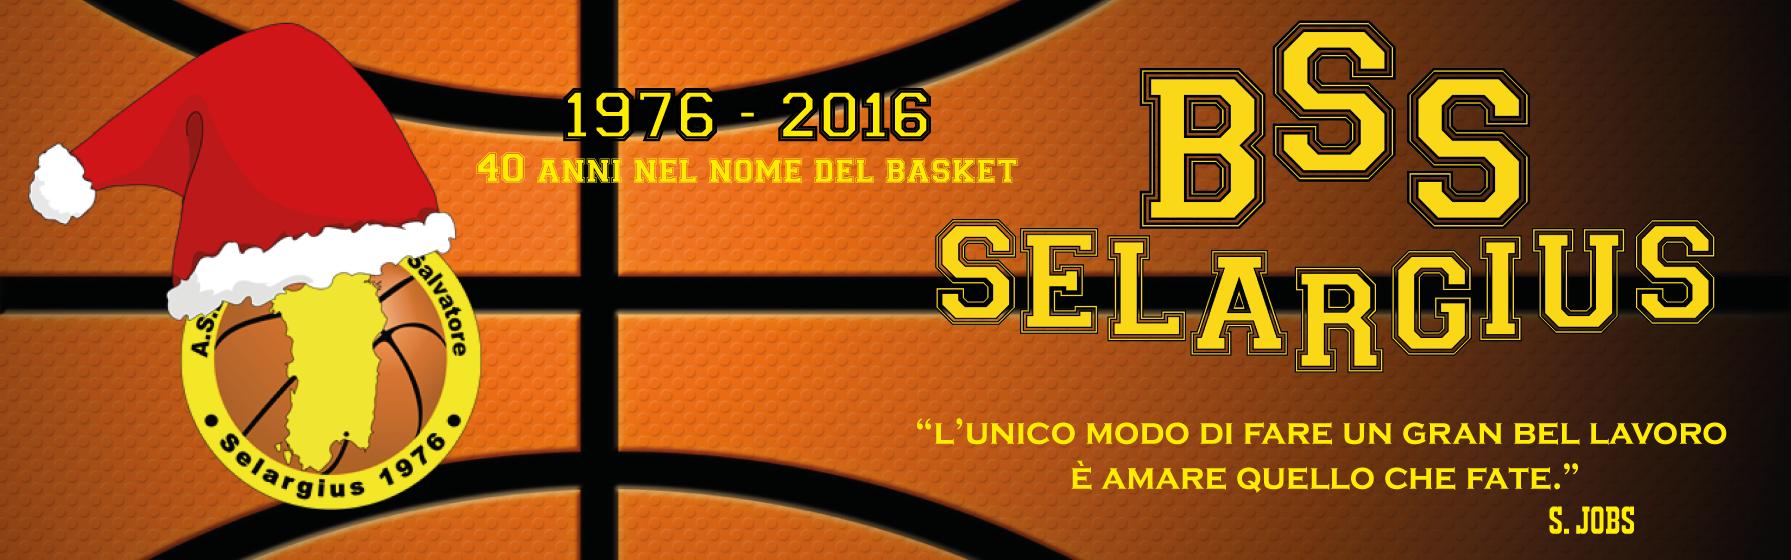 http://www.basketsansalvatore.it/wp/wp-content/uploads/2019/12/A-Test-sfondo-sito-e-fb-rev.-1-natale.png